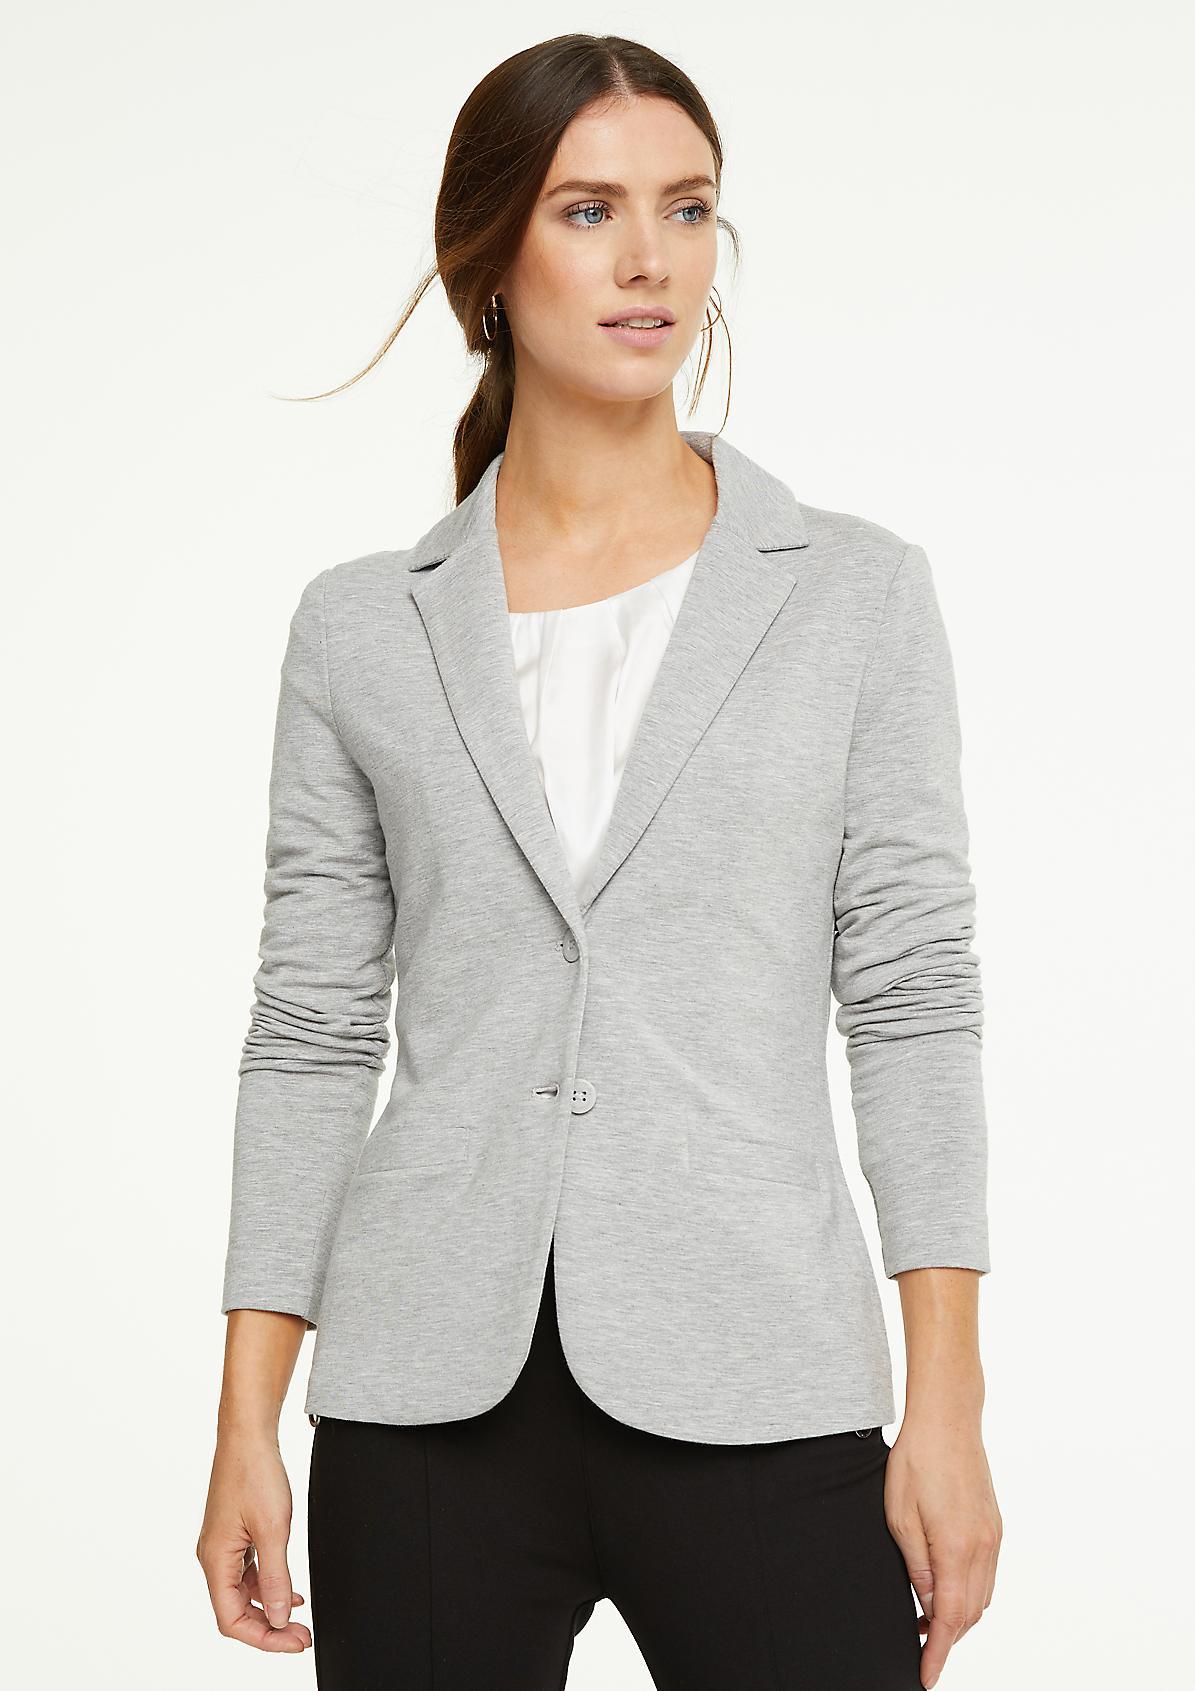 Stretch blazer made of sweatshirt fabric from comma